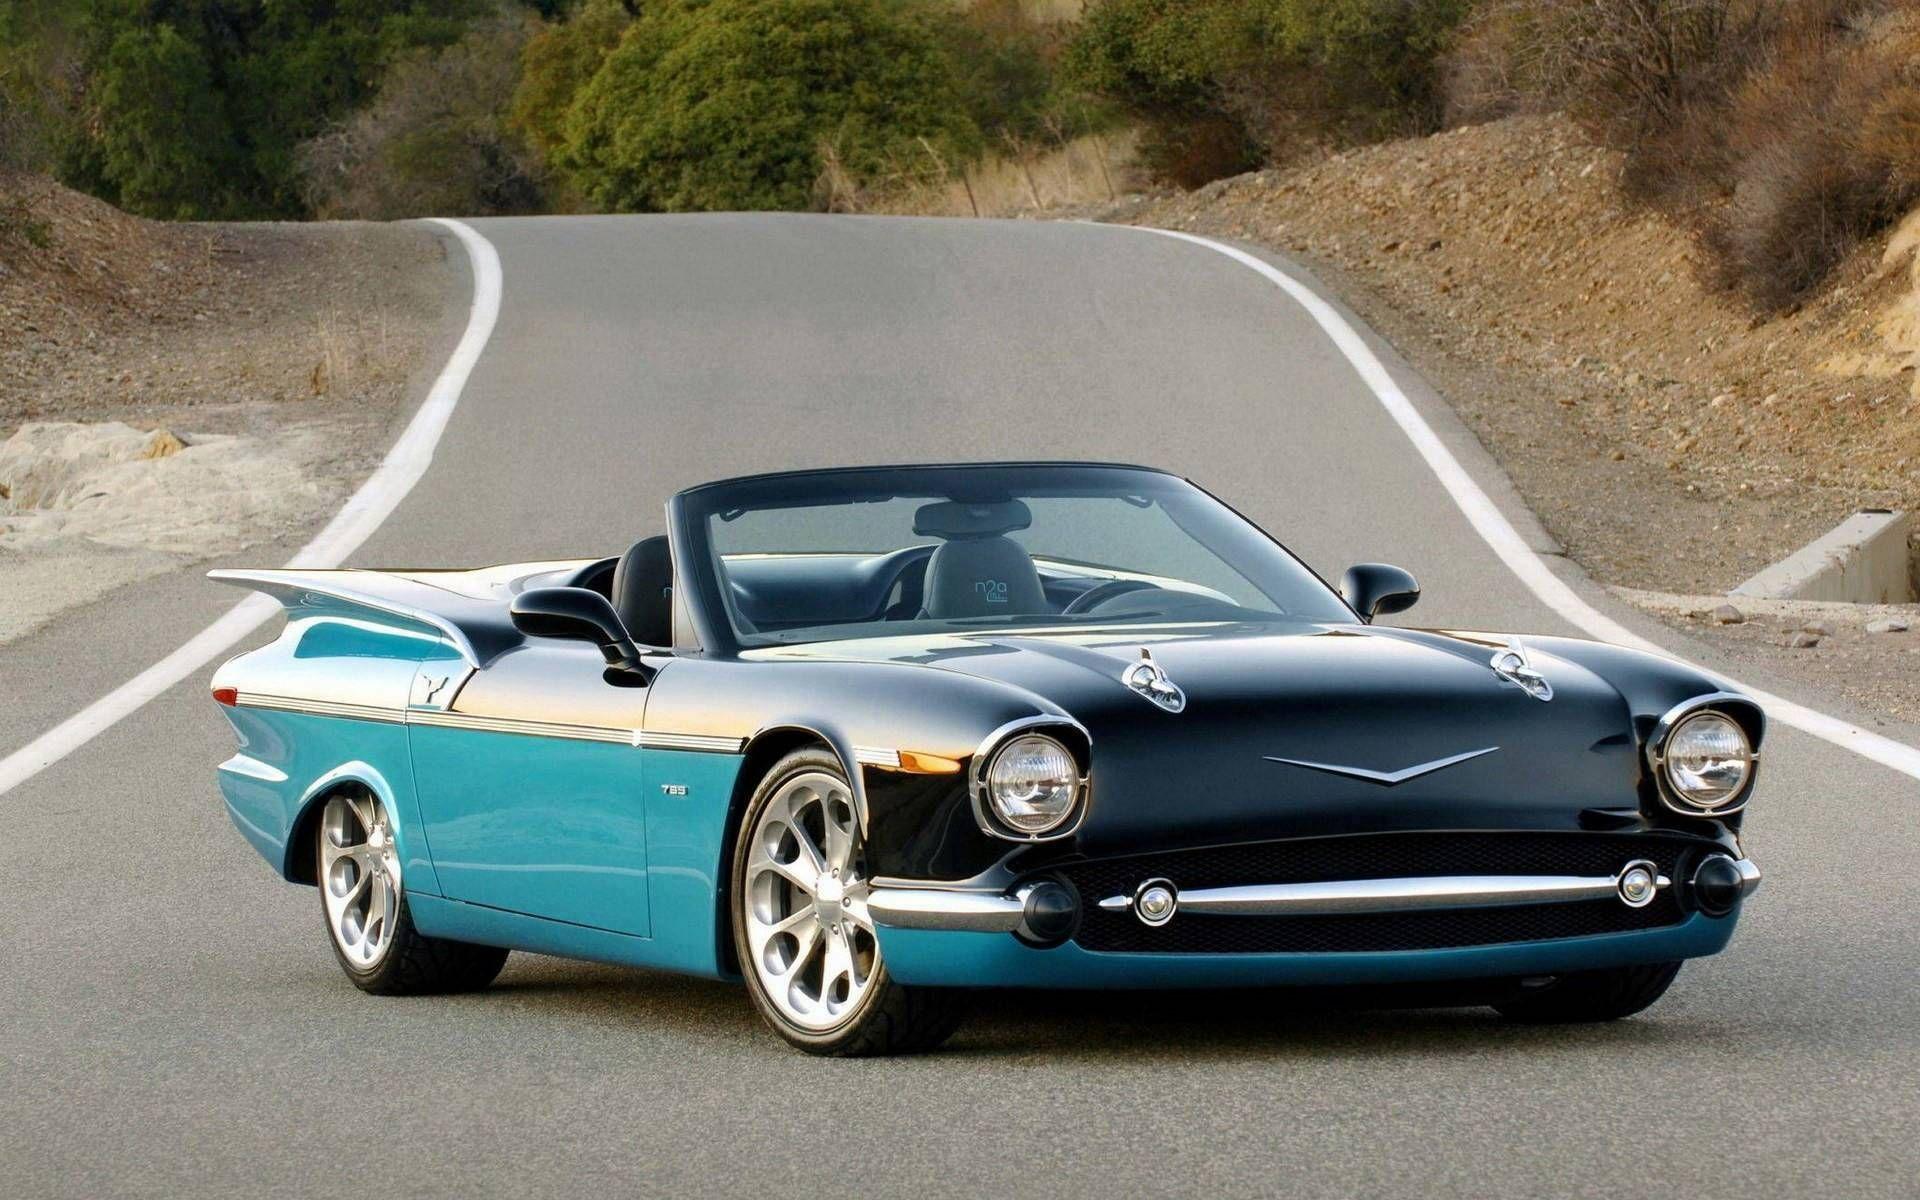 Old Classic Cars | Classic Car Wide Desktop Backgrounds,Stills ...